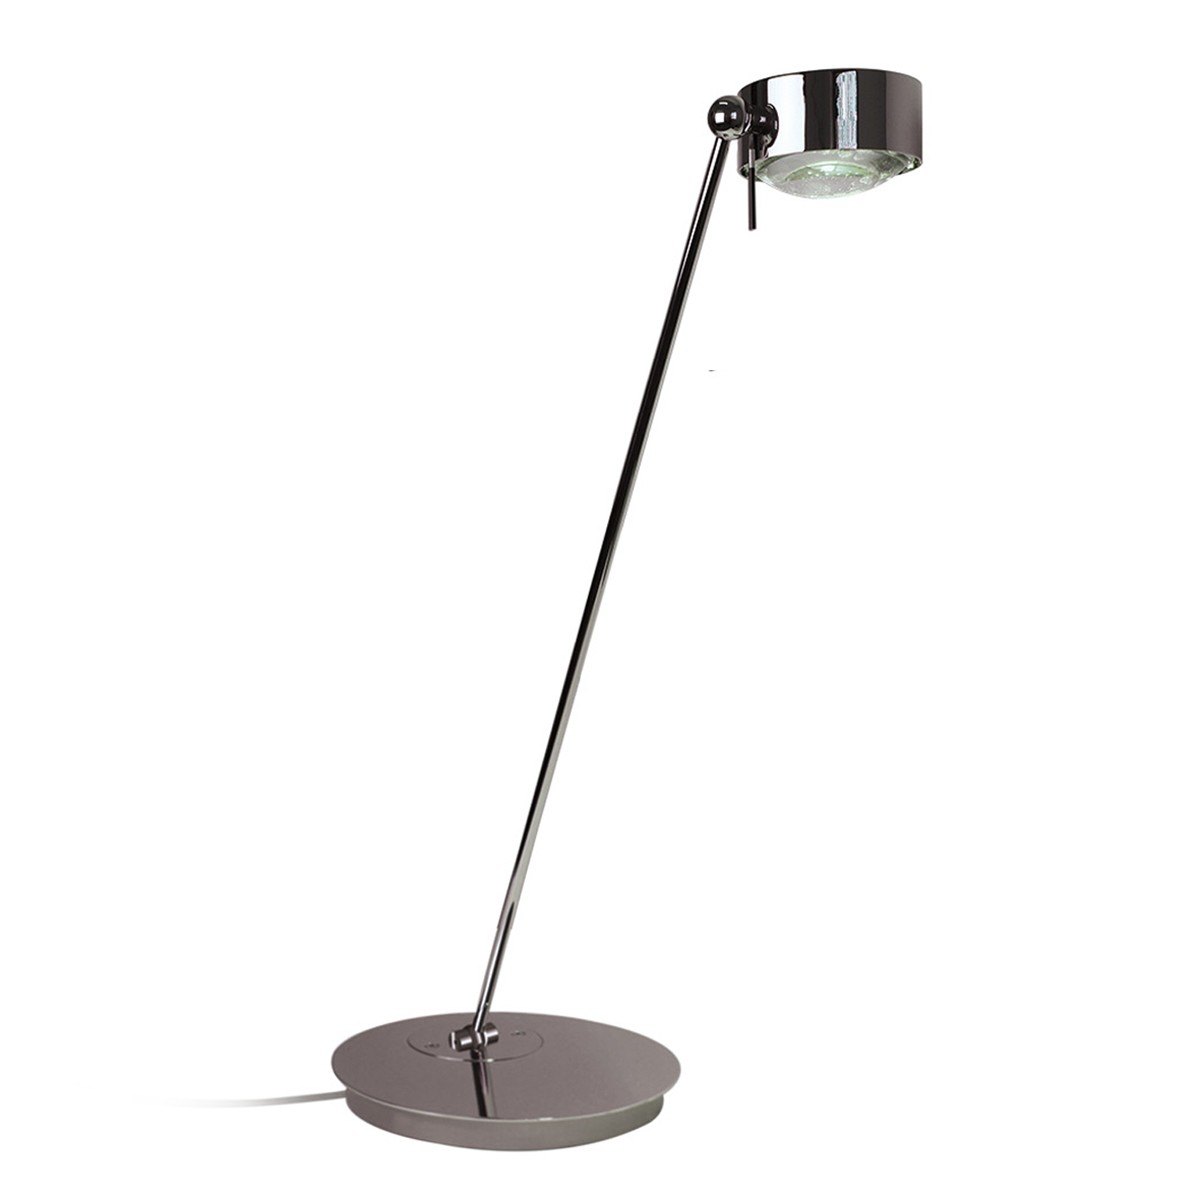 Top Light Puk Maxx Table Tischleuchte, 80 cm